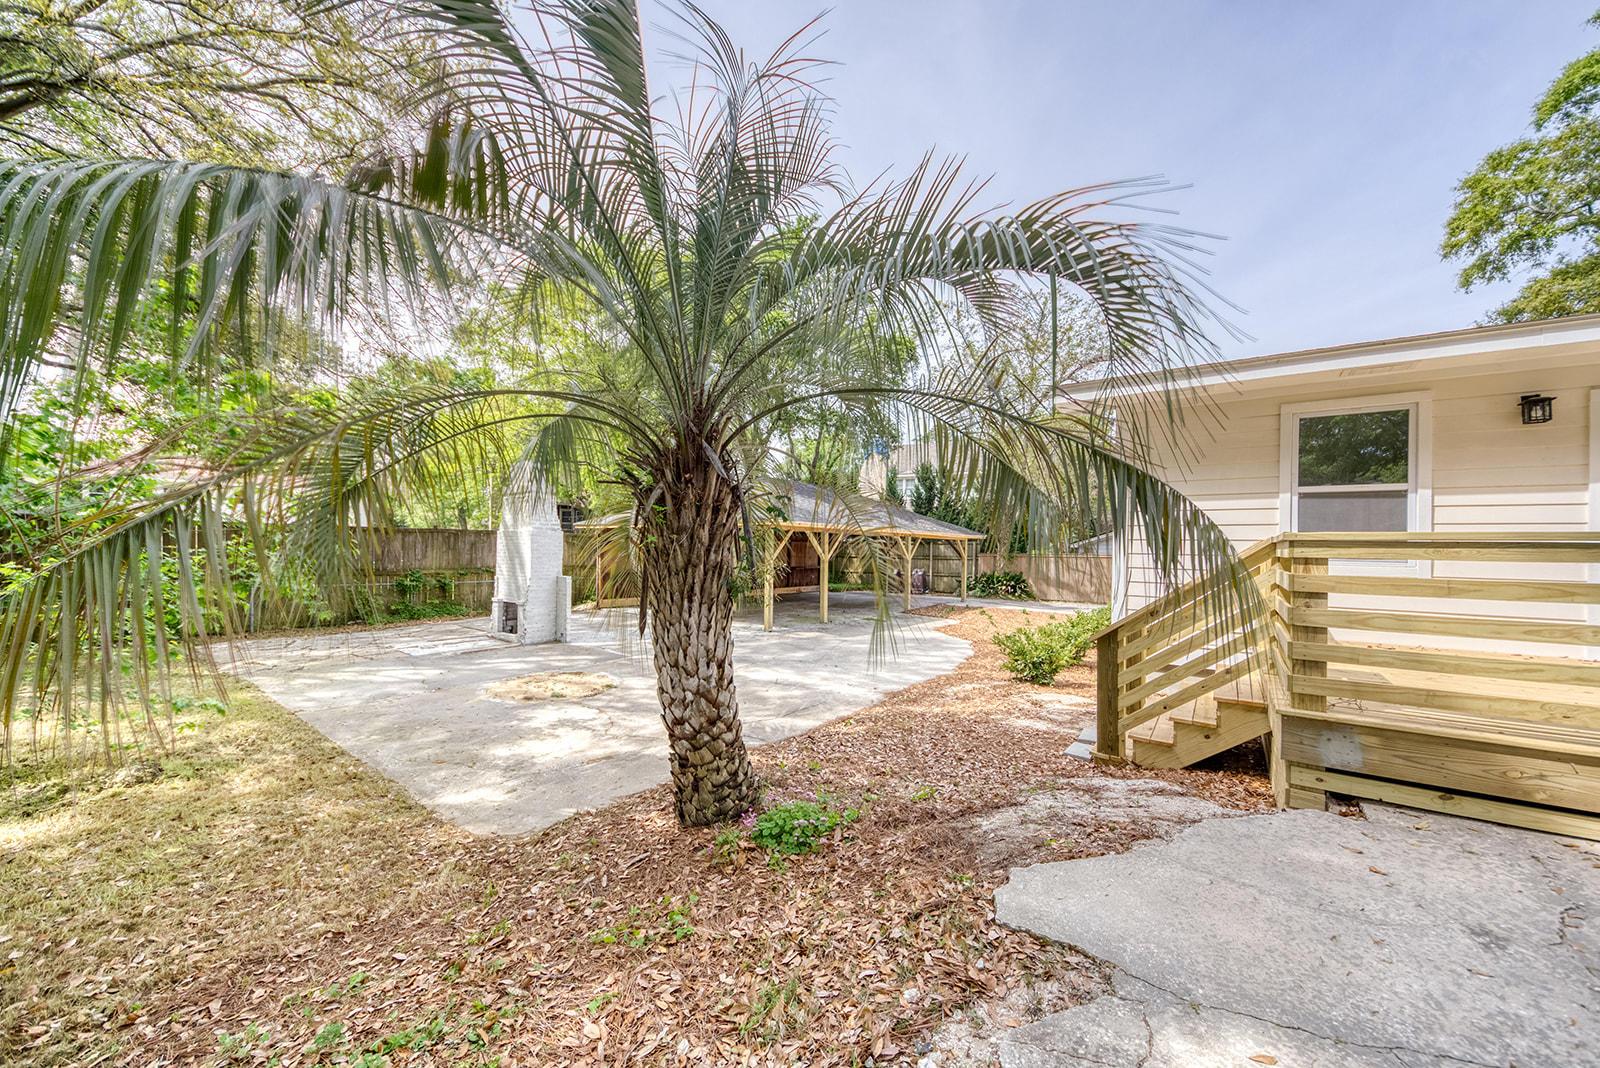 Bay View Acres Homes For Sale - 265 Coleman, Mount Pleasant, SC - 47